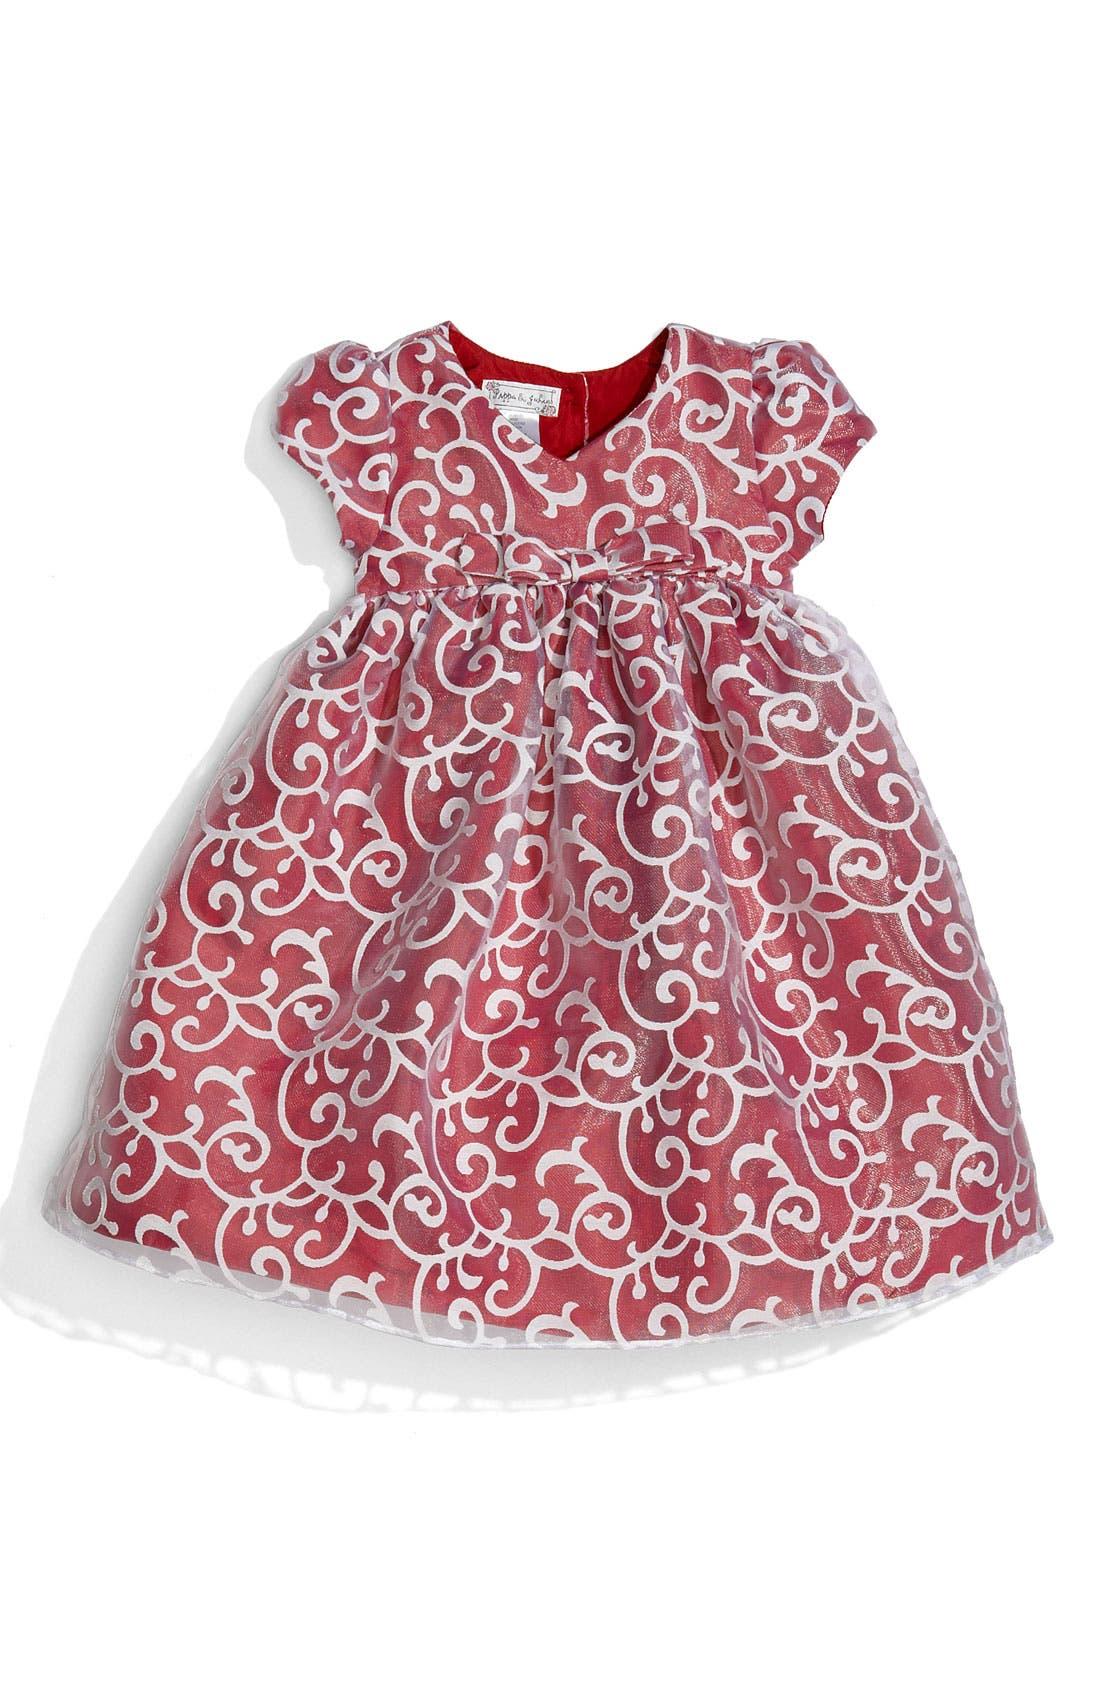 Main Image - Pippa & Julie Sateen Dress (Infant)